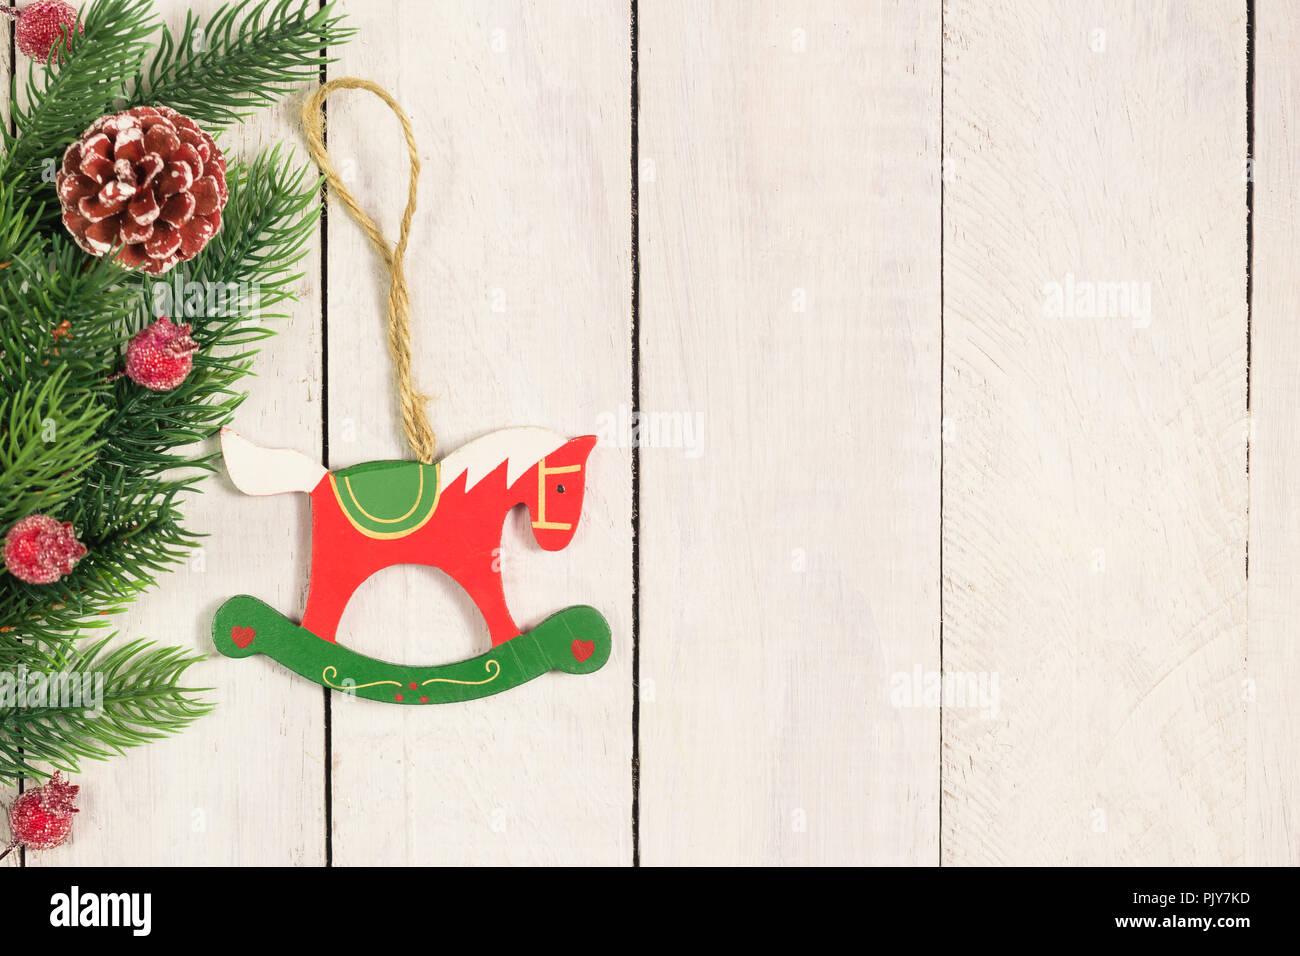 Navidad De Con Sobre Juguete El Abeto Mostrador Madera Ramas XikPZOu